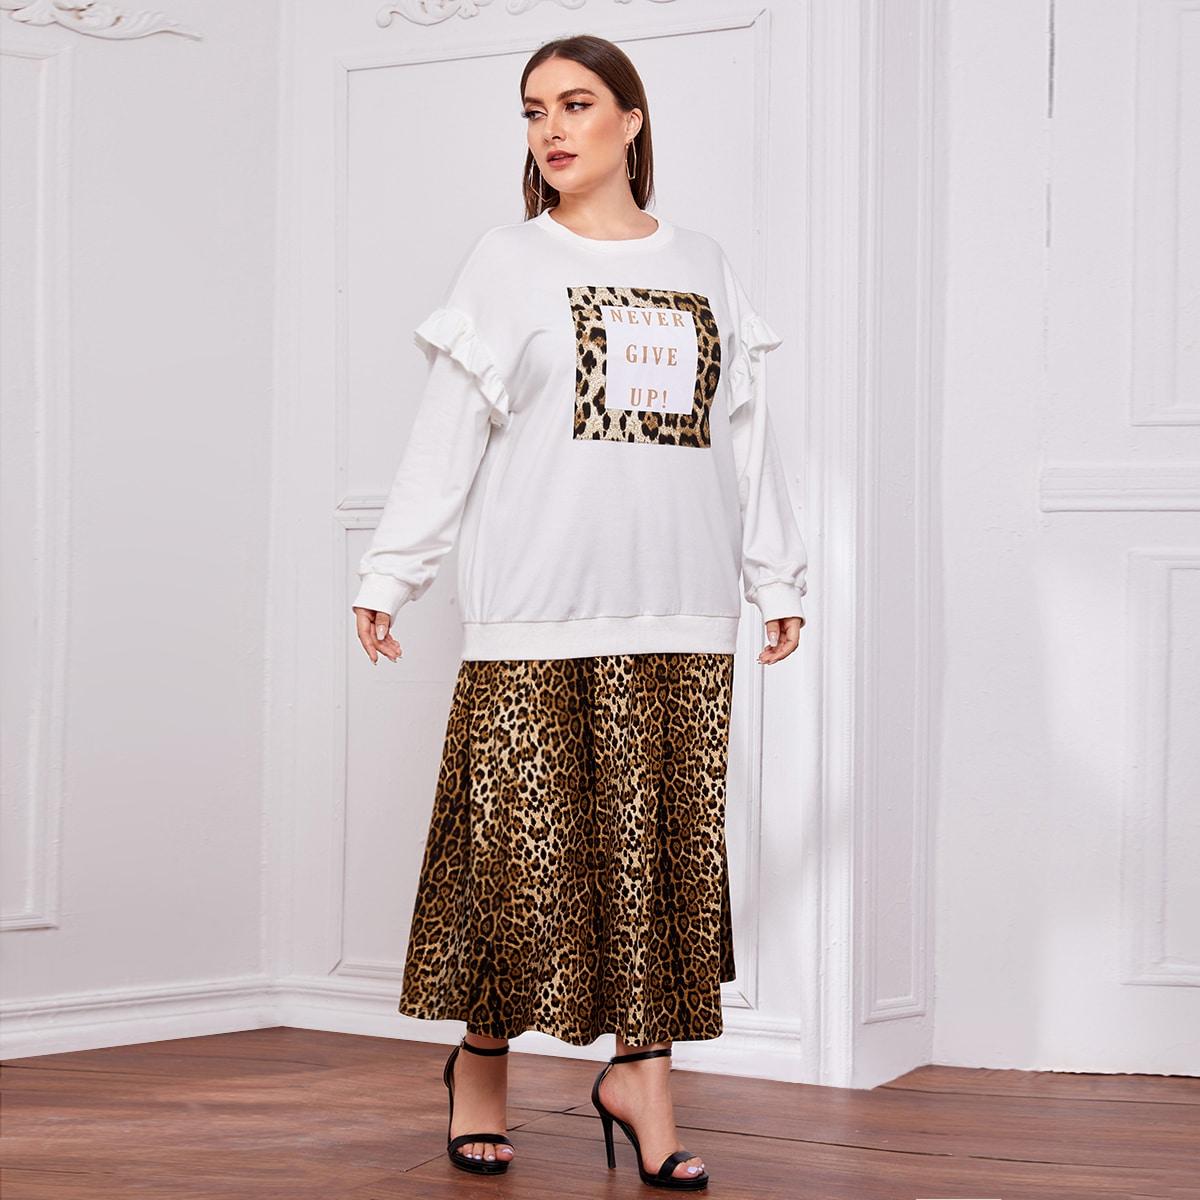 Plus Leopard Slogan Graphic Ruffle Detail Sweatshirt & Skirt Set